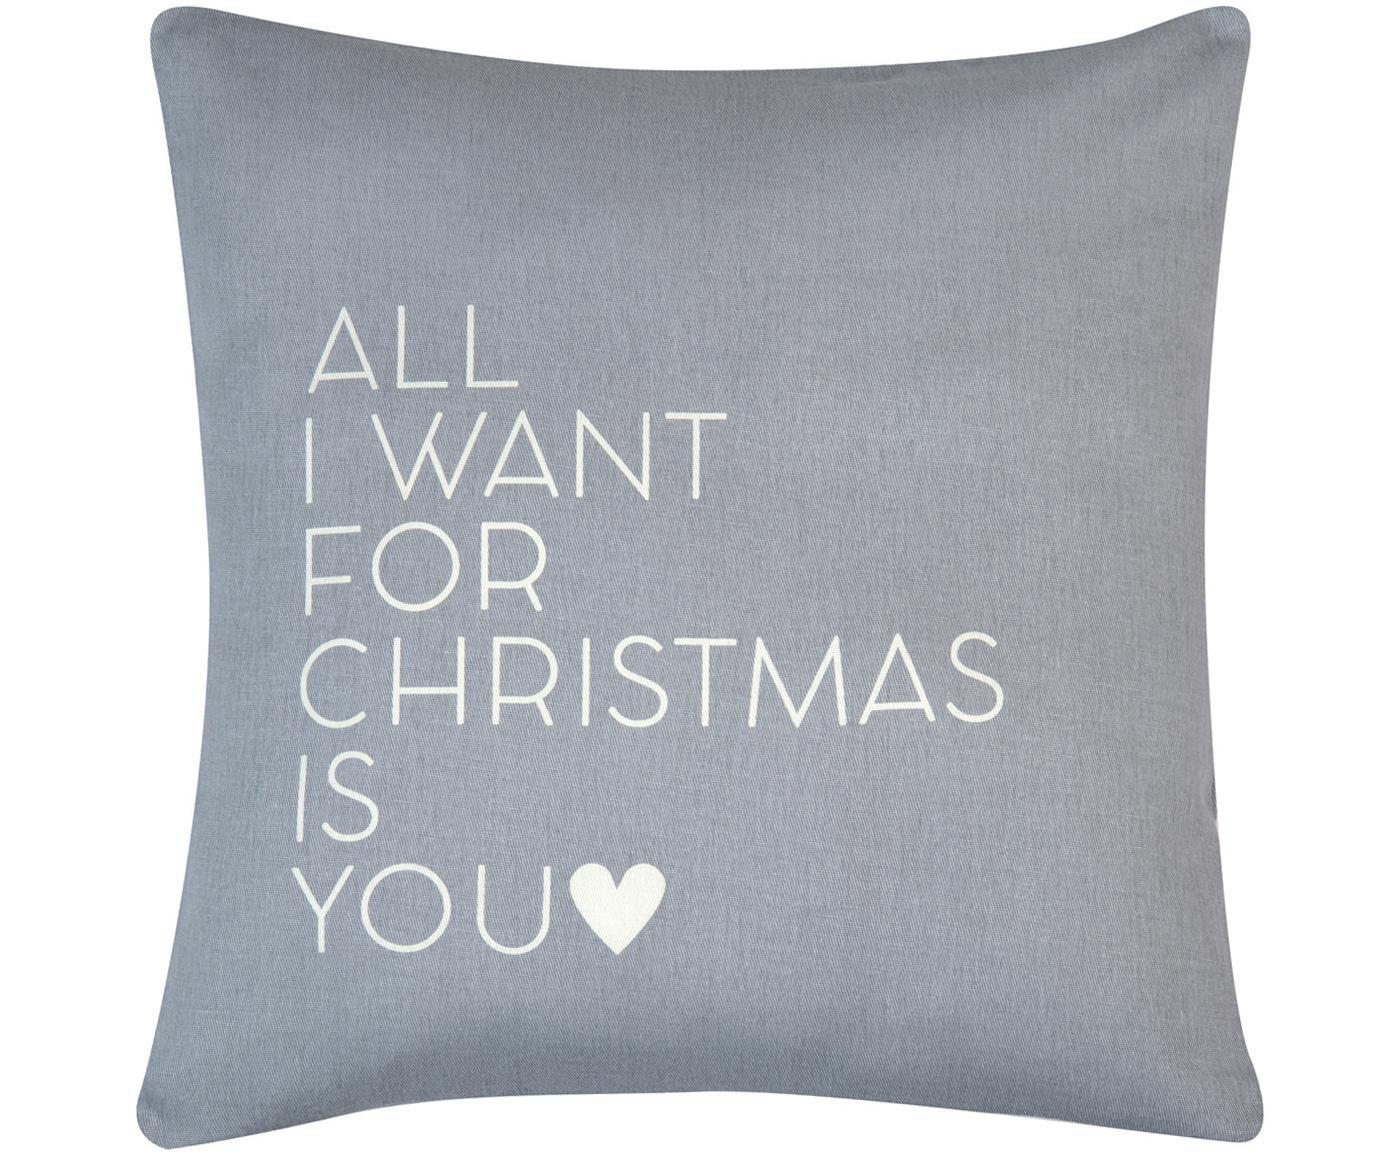 Poszewka na poduszkę All I Want, 100% bawełna, splot panama, Szary,ecru, S 40 x D 40 cm